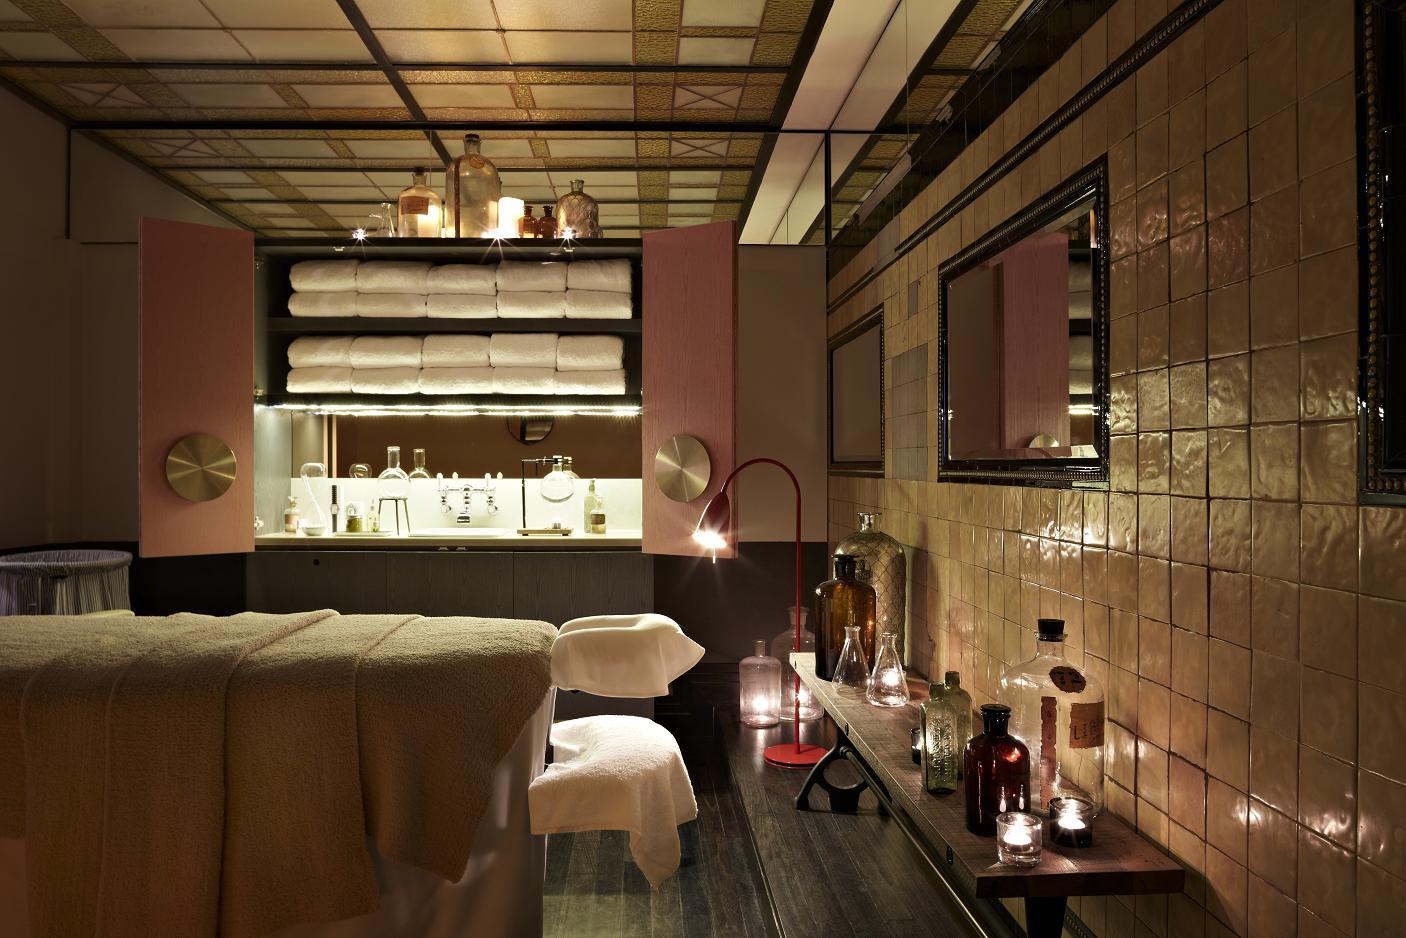 QT_Sydney_Private_Treatment_Room 20x copy.JPG